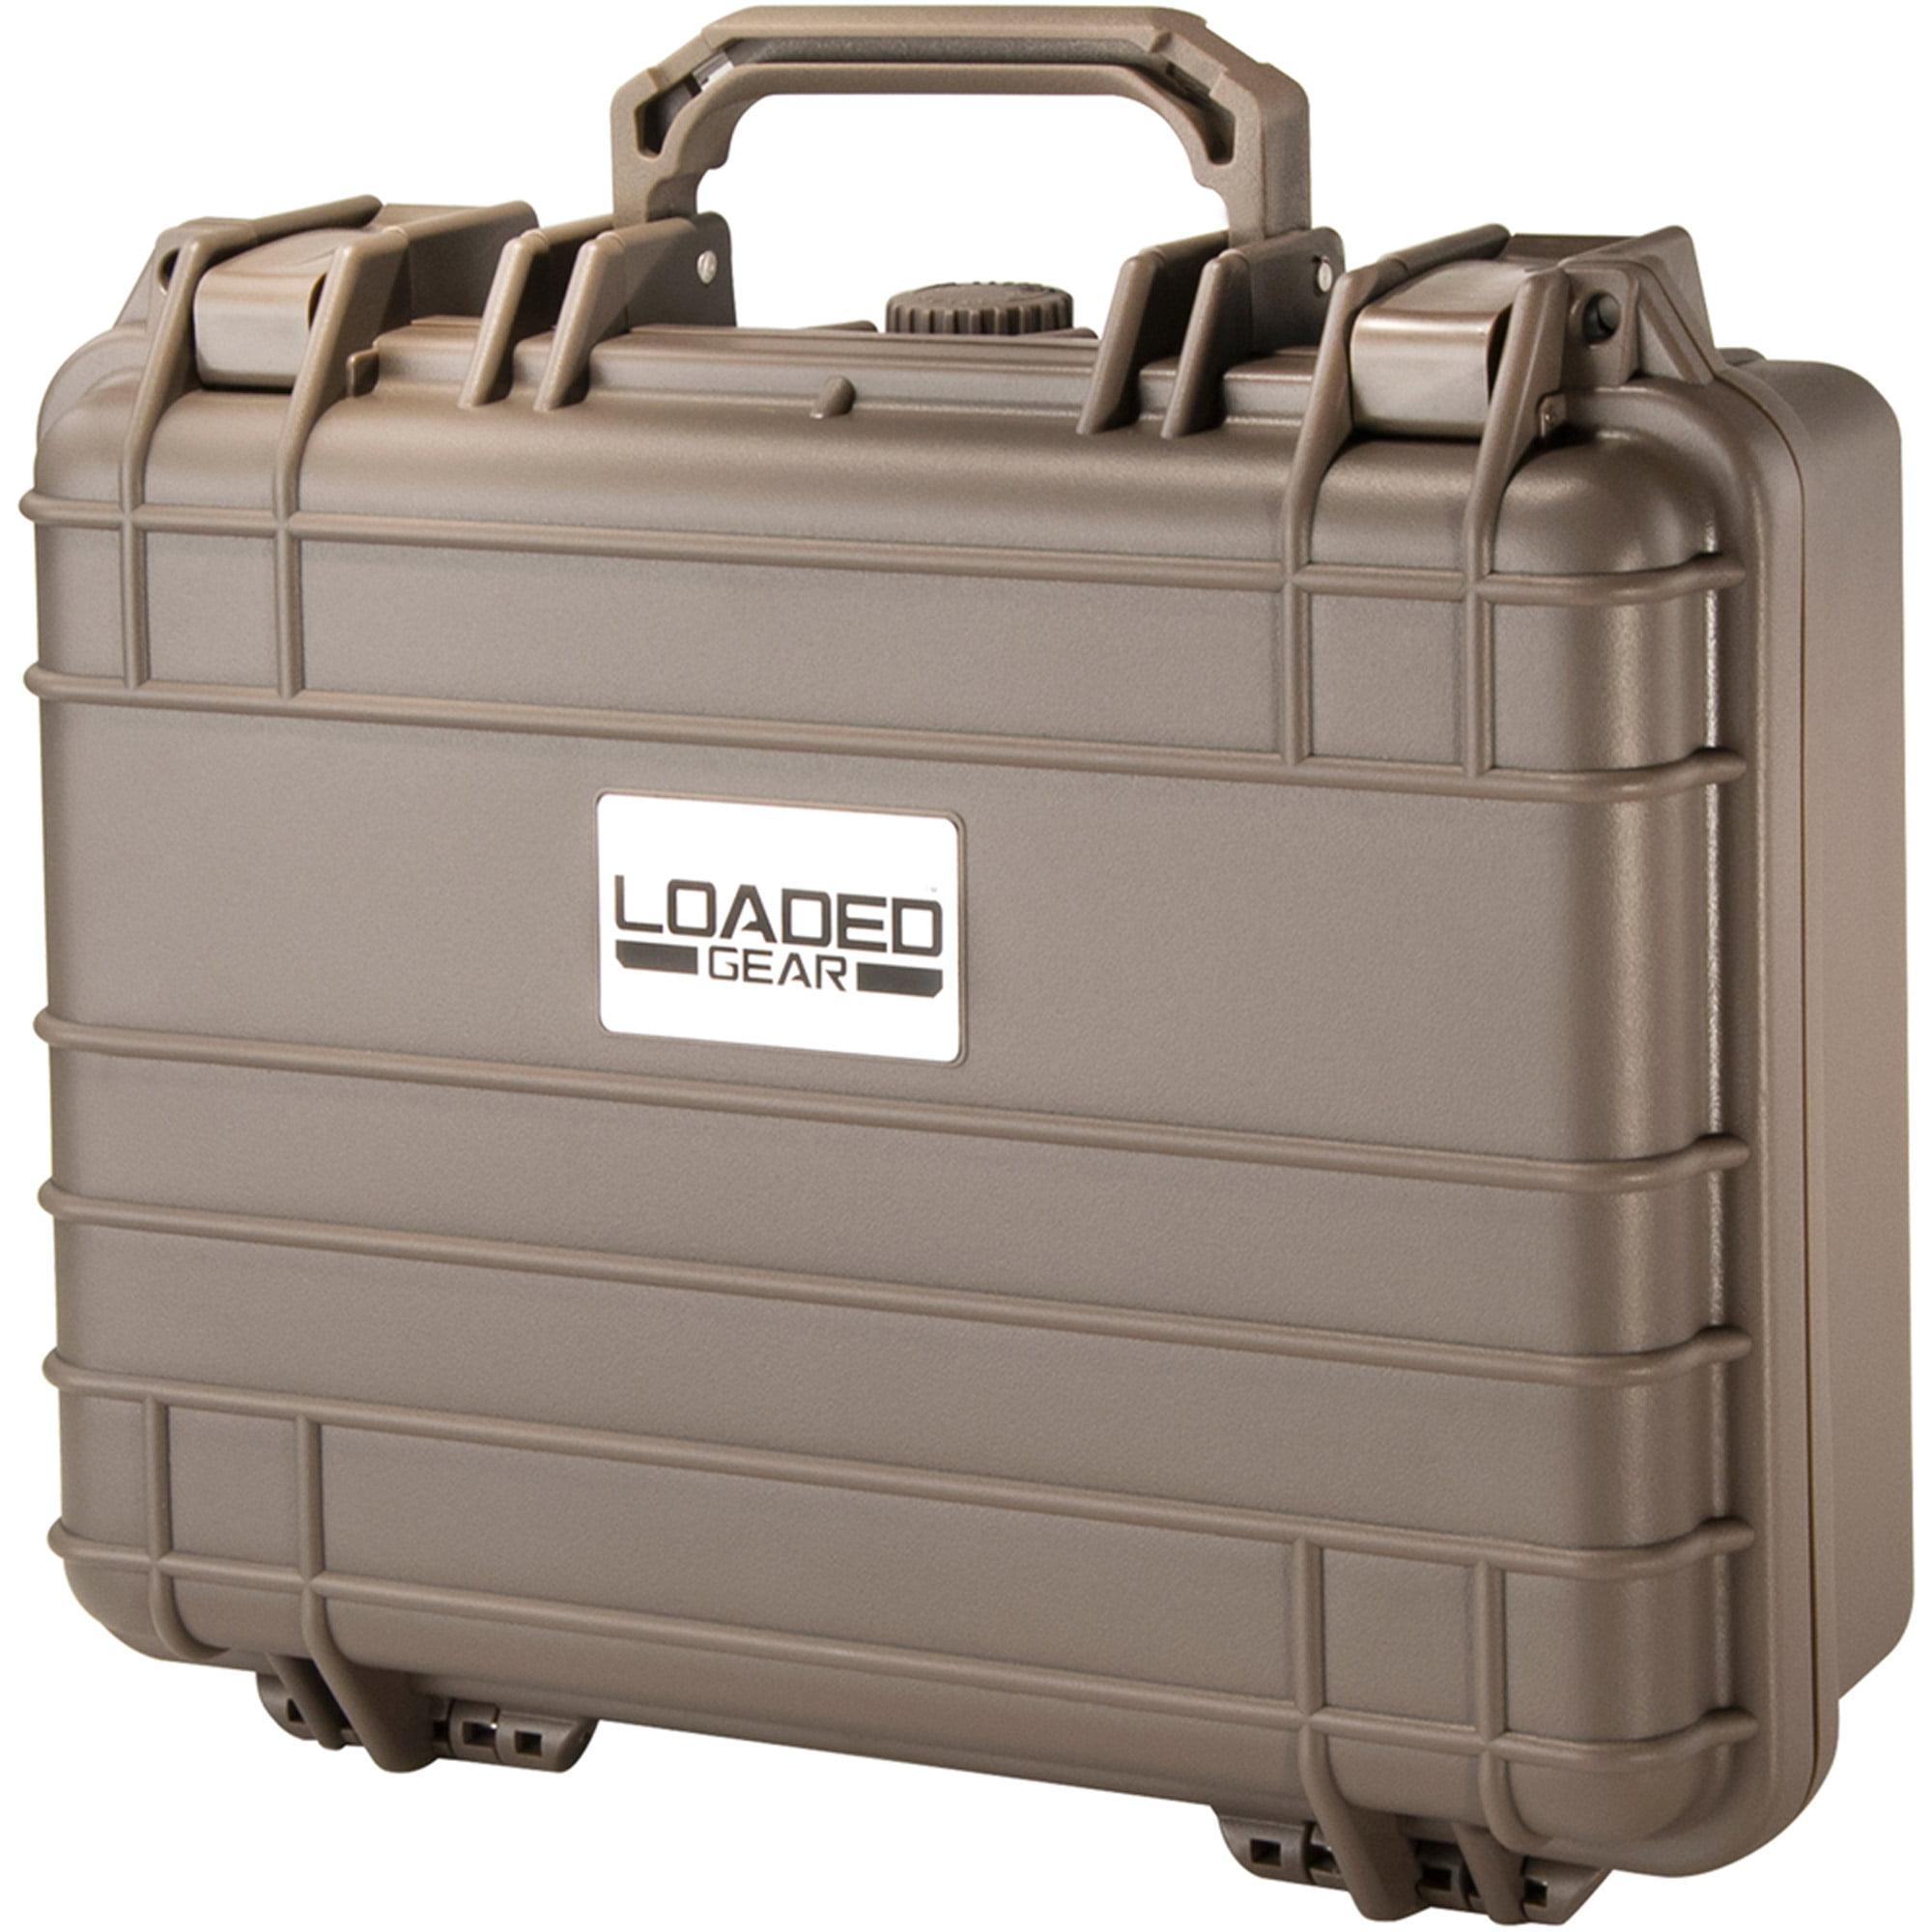 Barska Optics Loaded Gear Hard Case, HD 200, Dark Earth